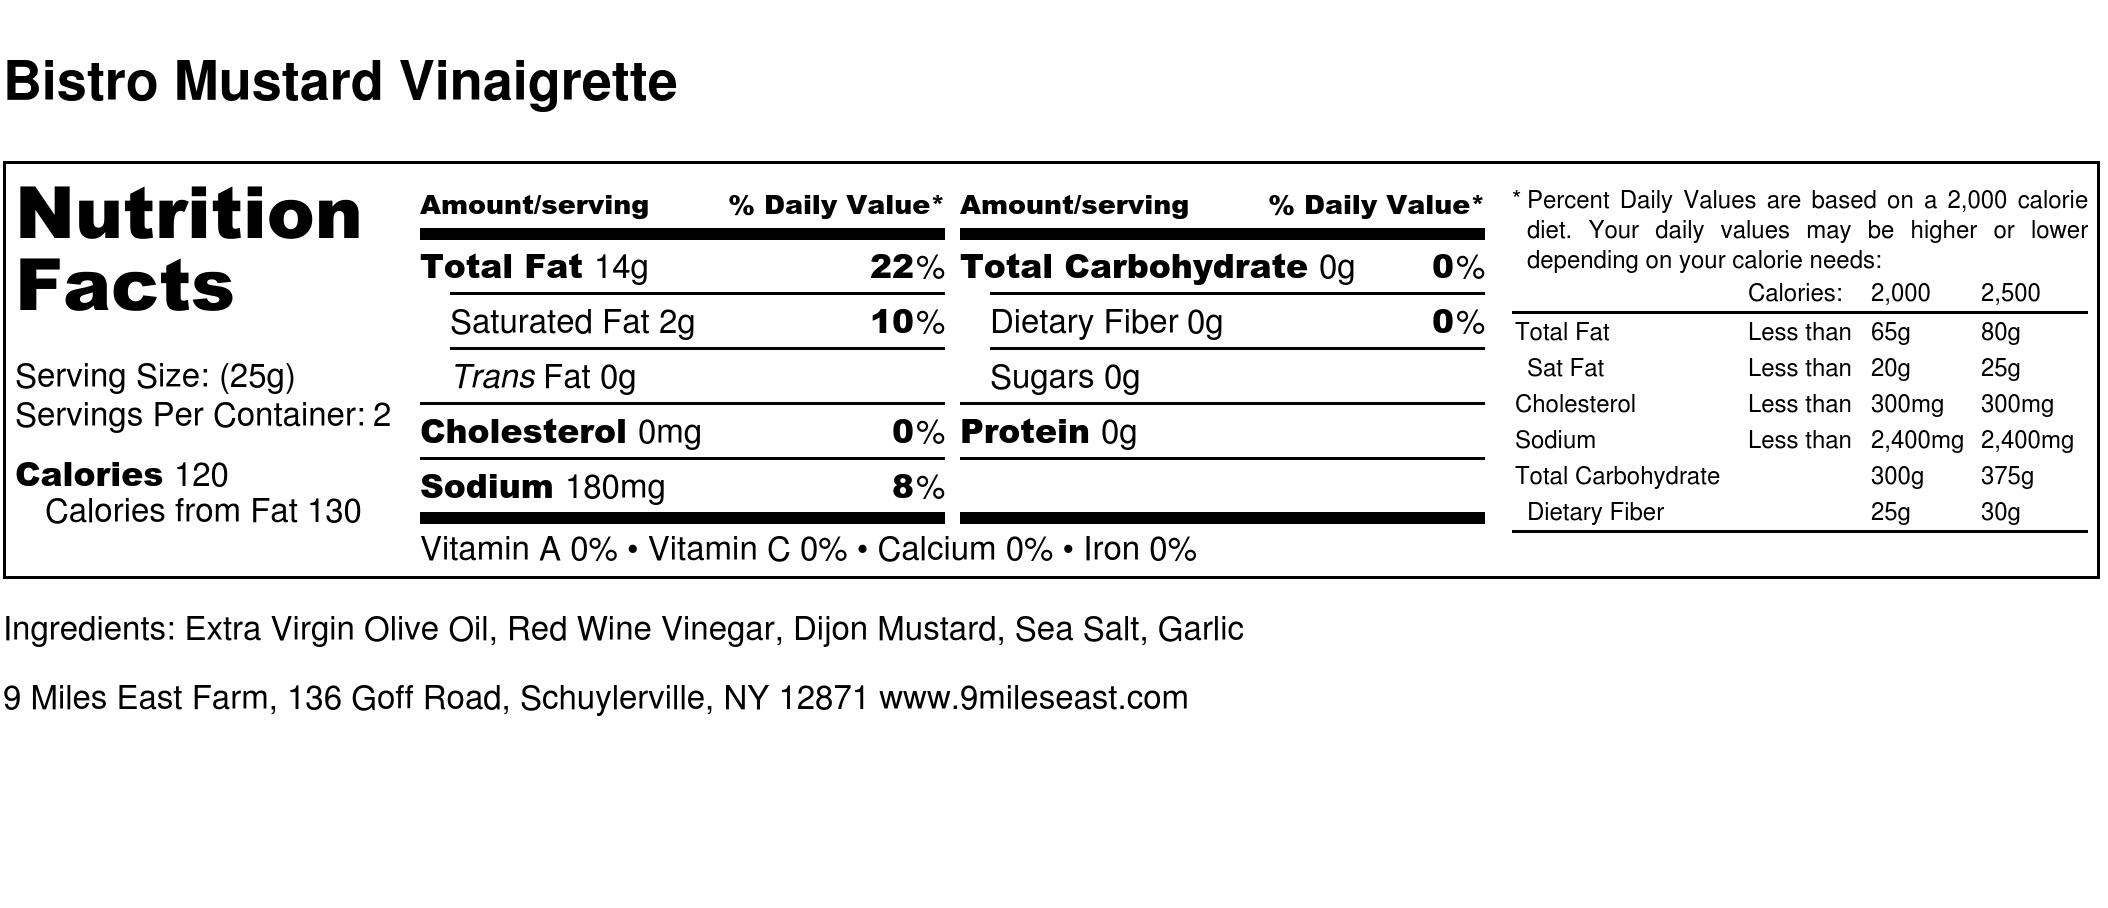 Bistro Mustard Vinaigrette - Nutrition Label.jpg